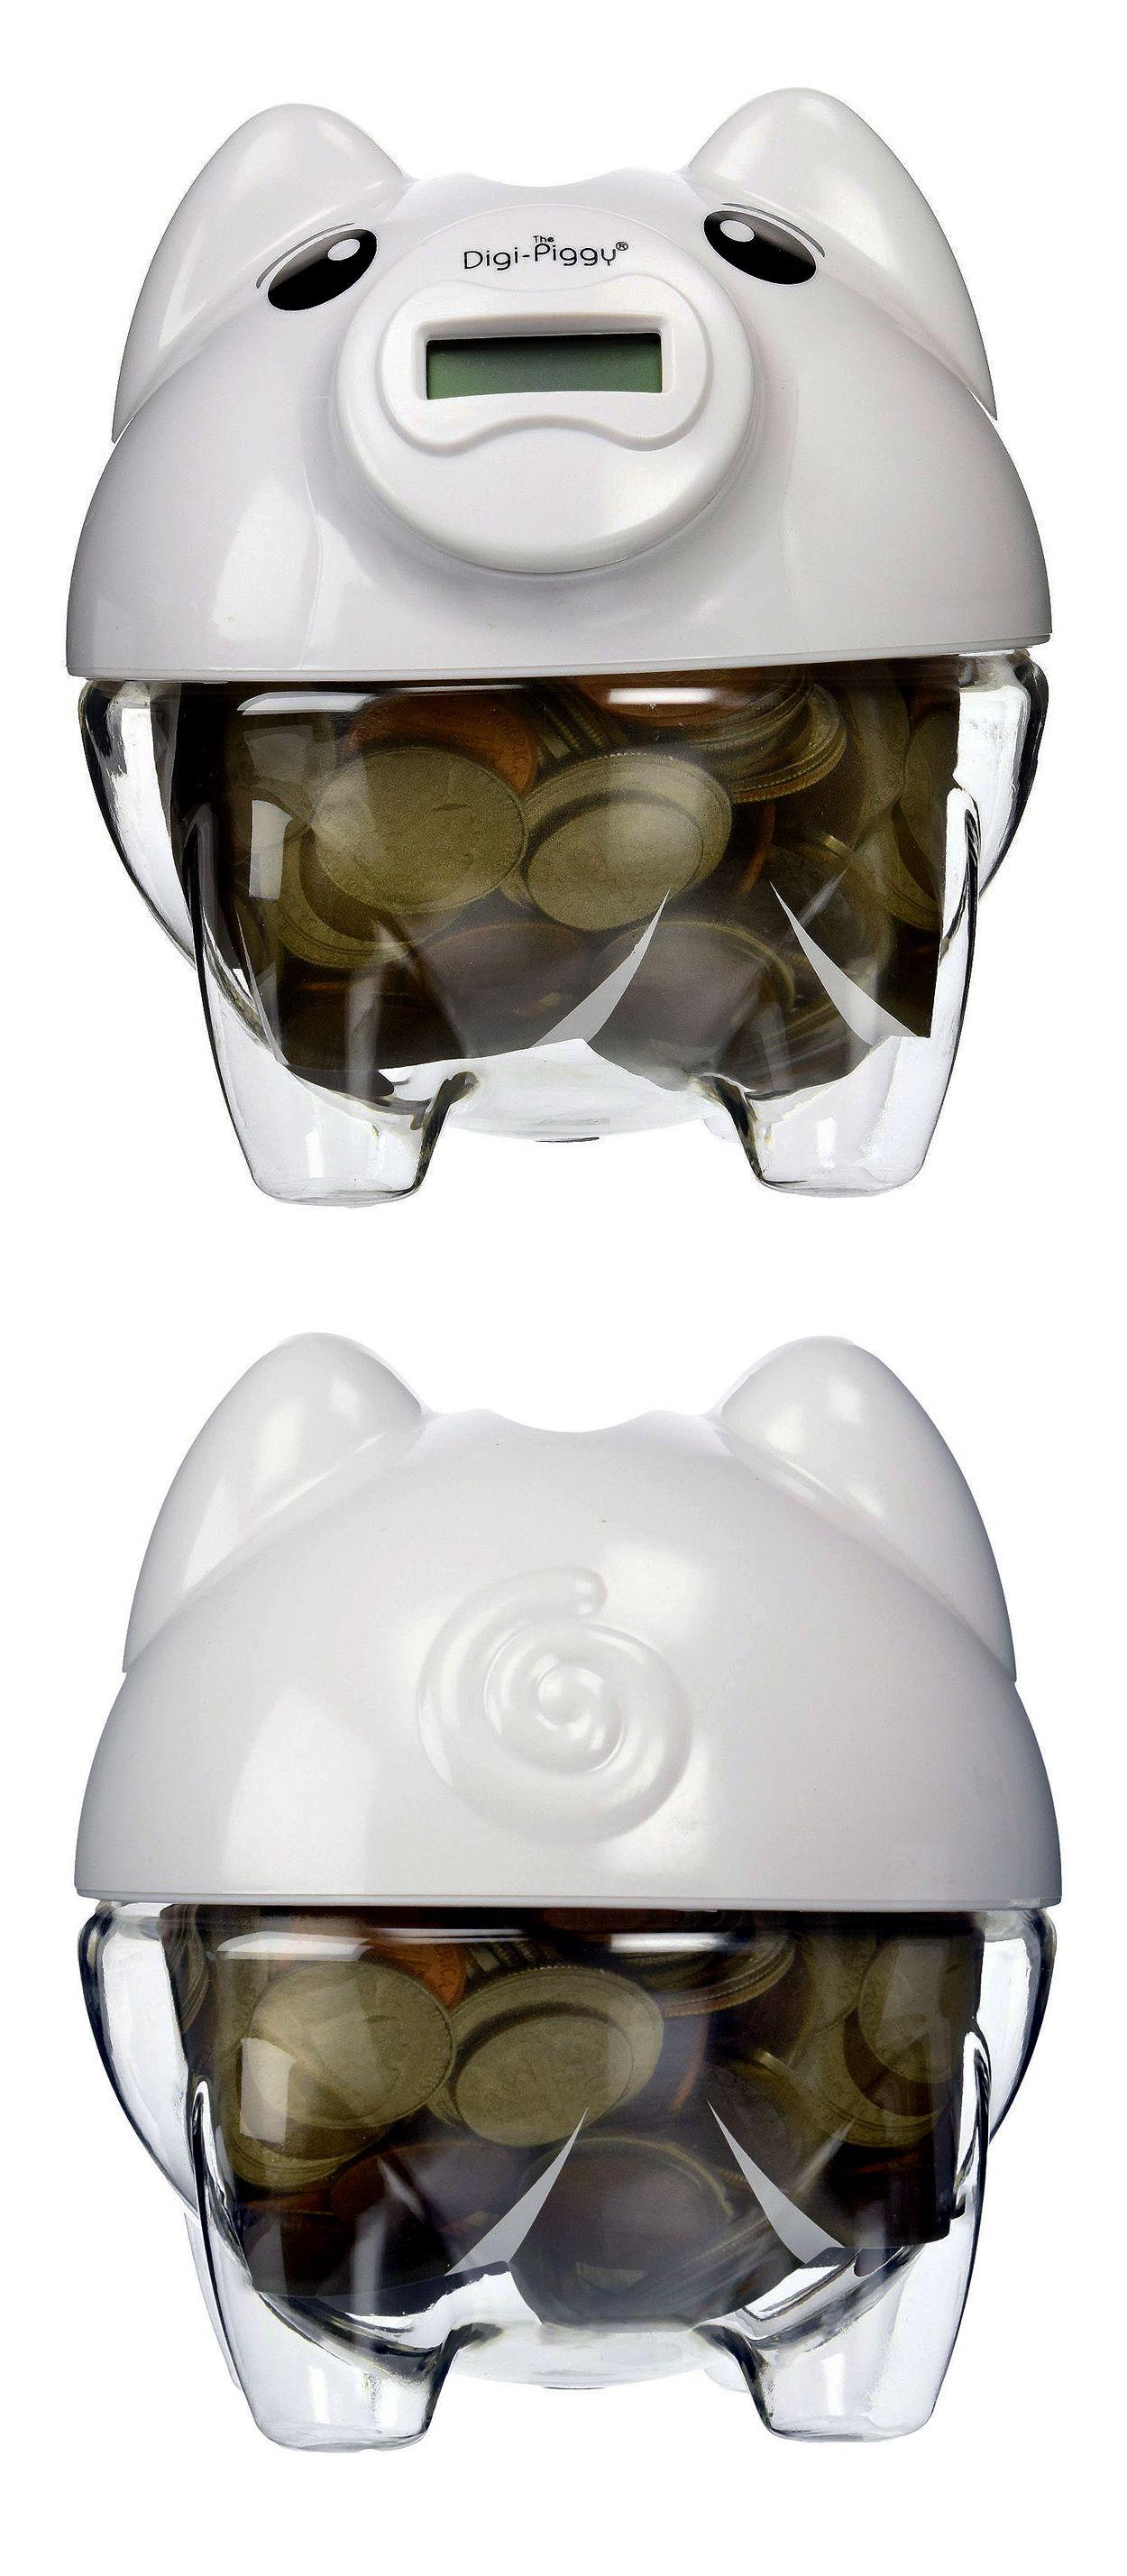 The Digi Piggy Digital Coin Counting Bank